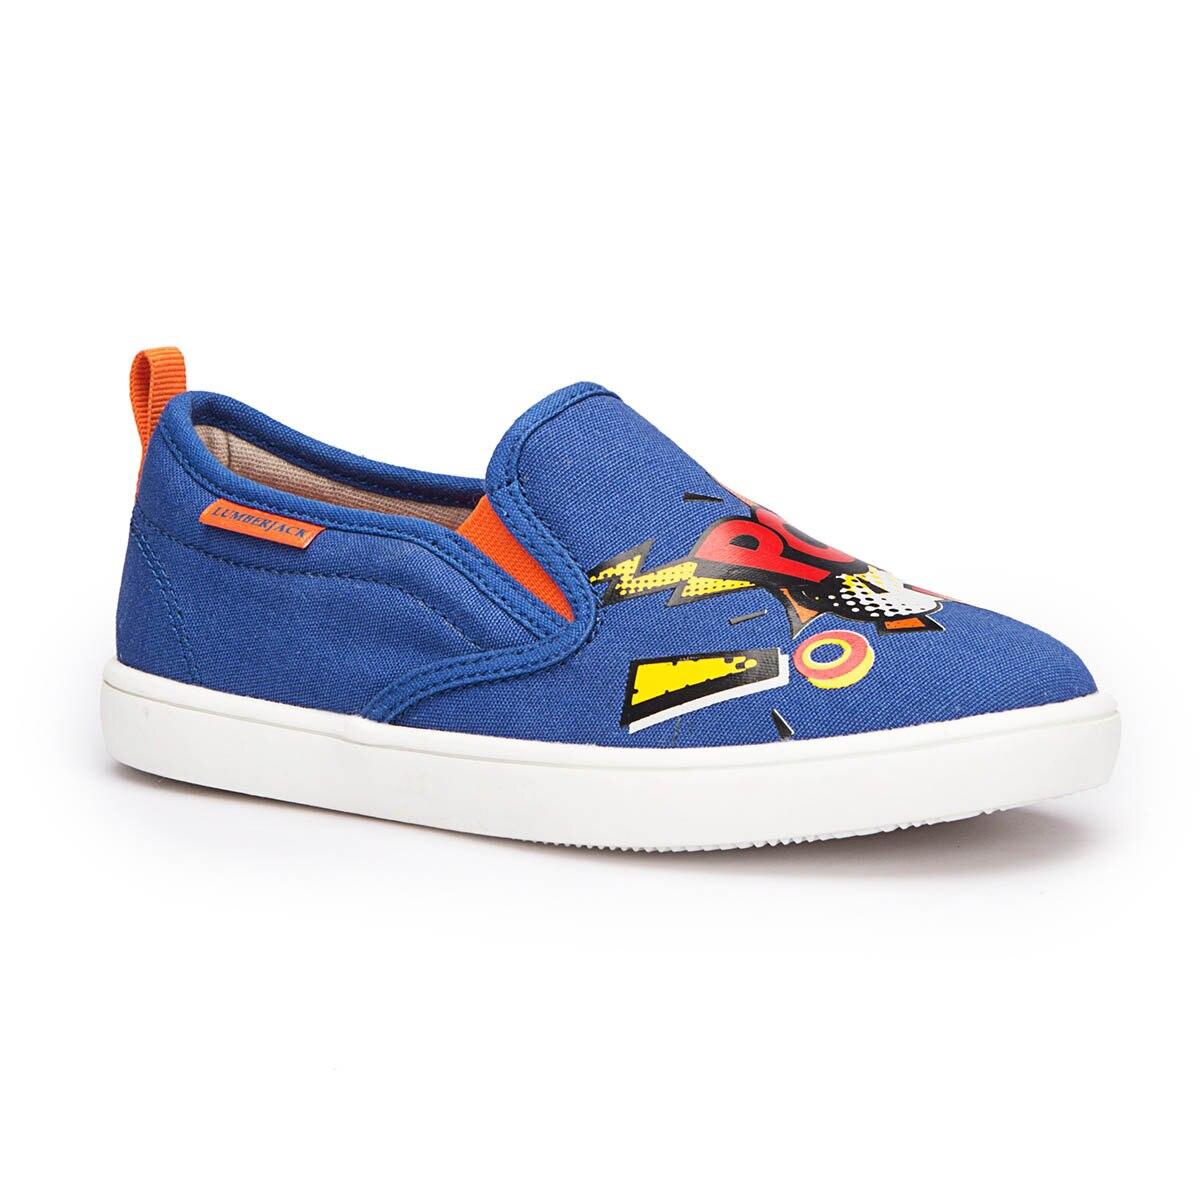 FLO POW Saks Male Child Slip On Shoes LUMBERJACK